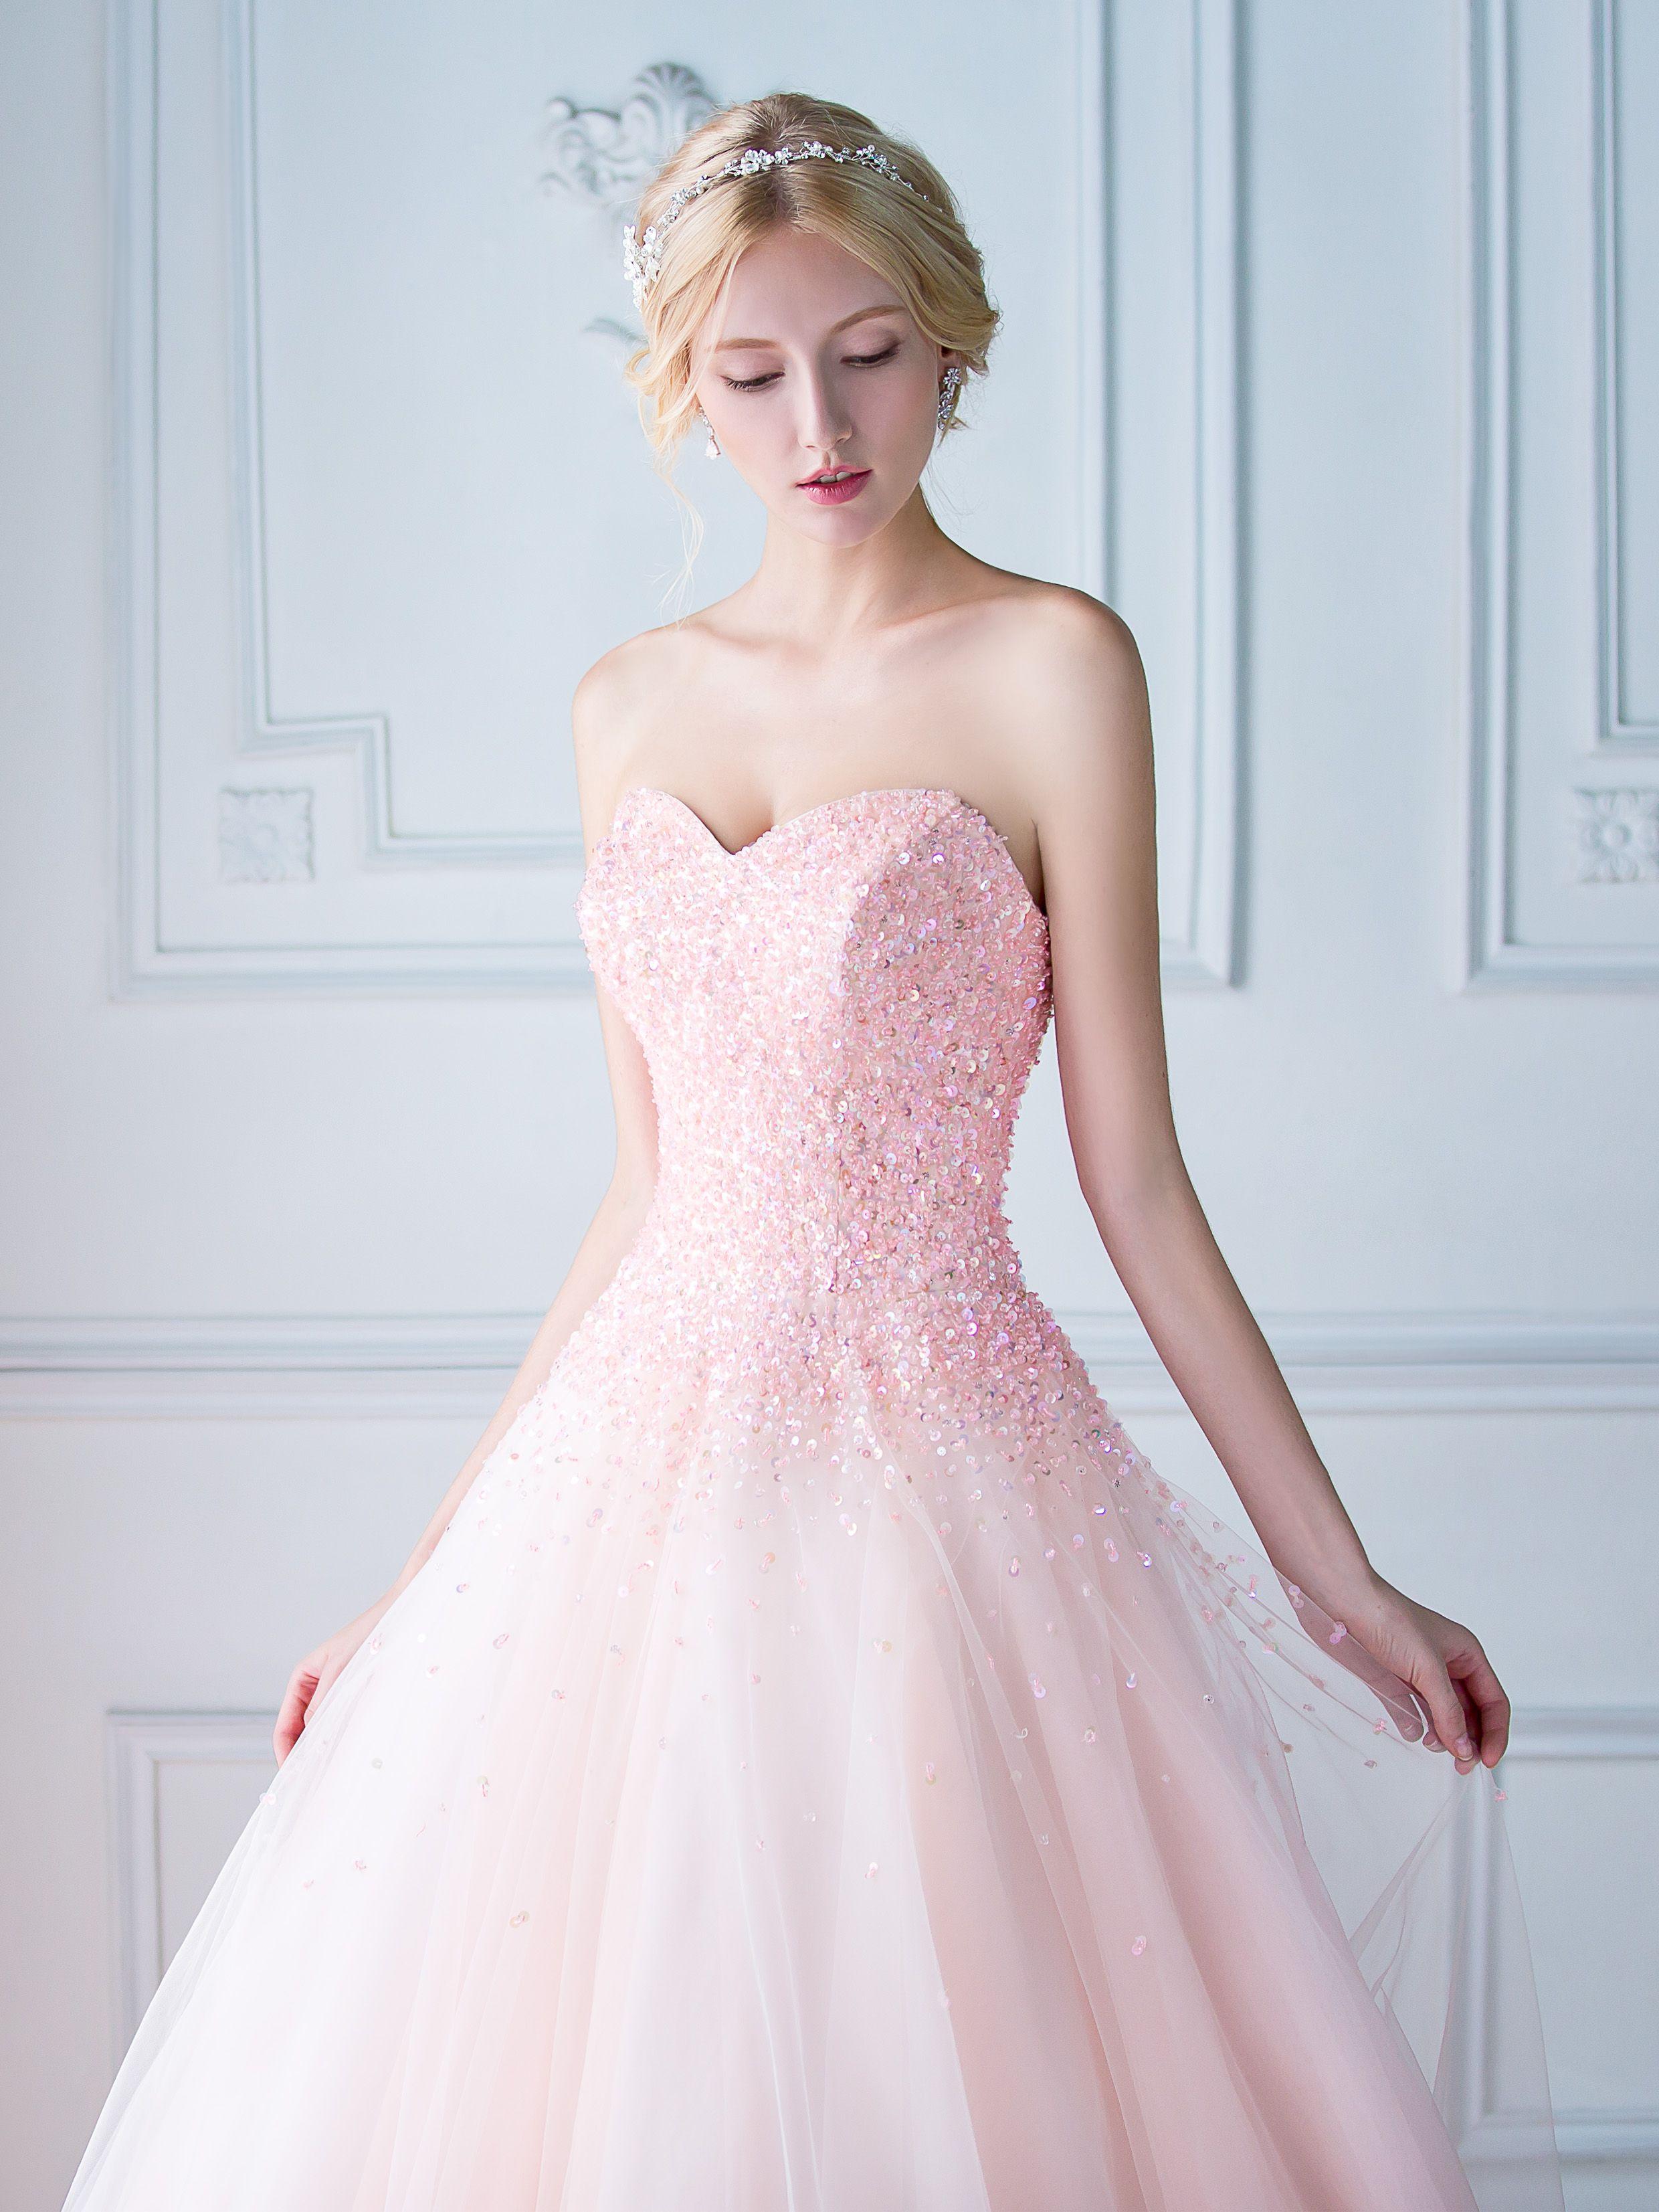 Digio Bridal Colorful Dreams Collection / Valentine